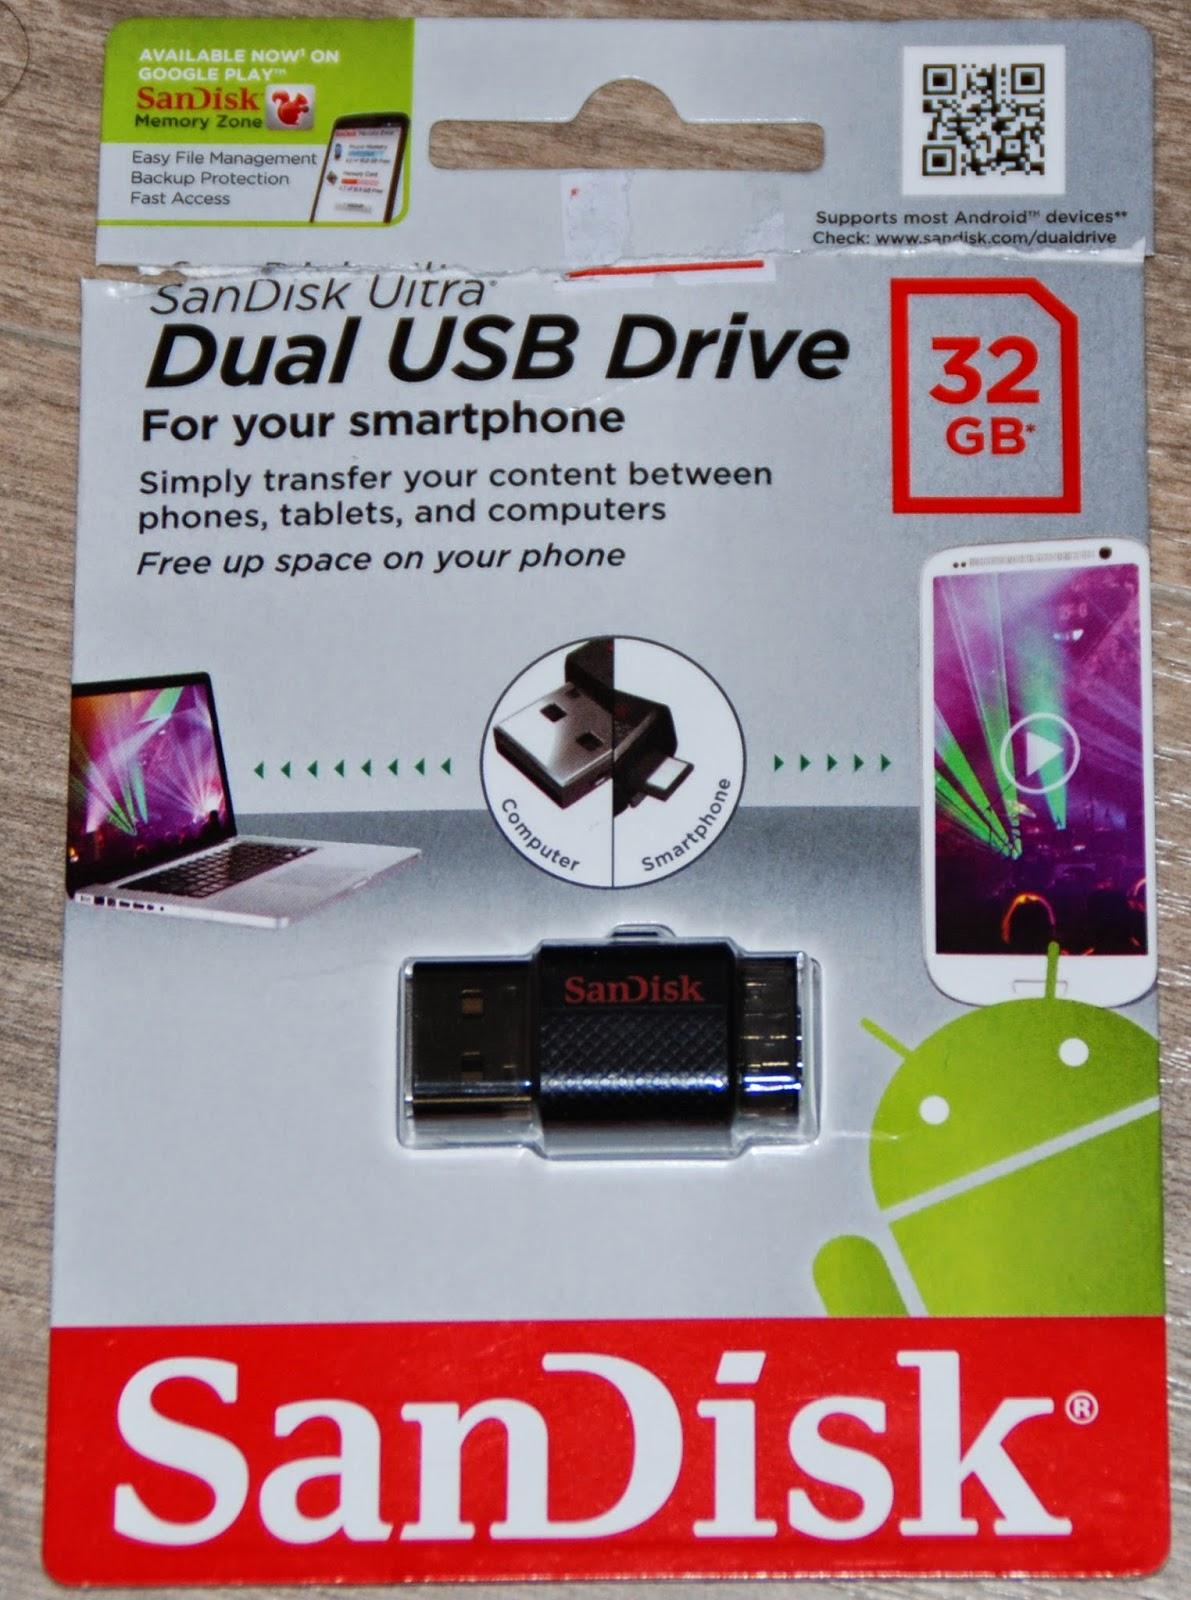 Sandisk Dual USB Drive